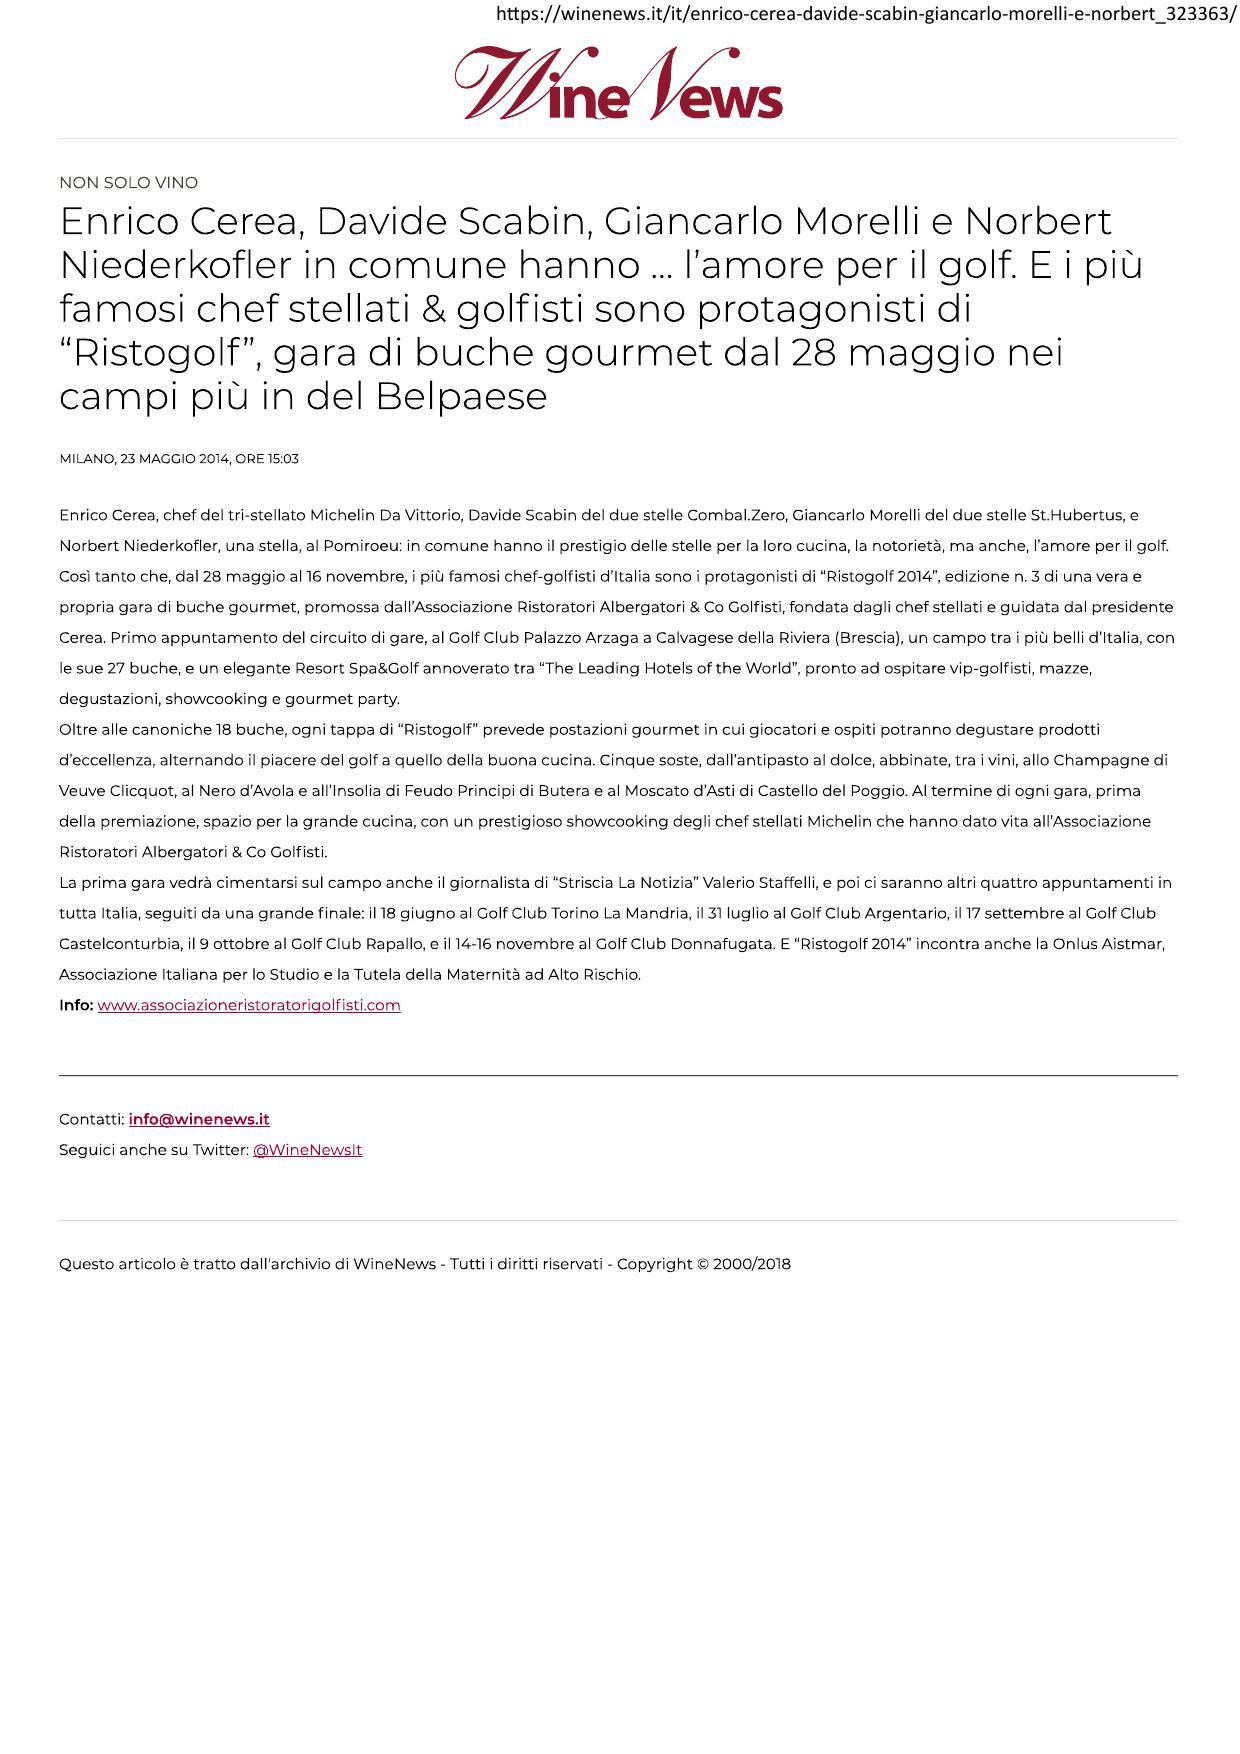 2014.05.23 Wine News